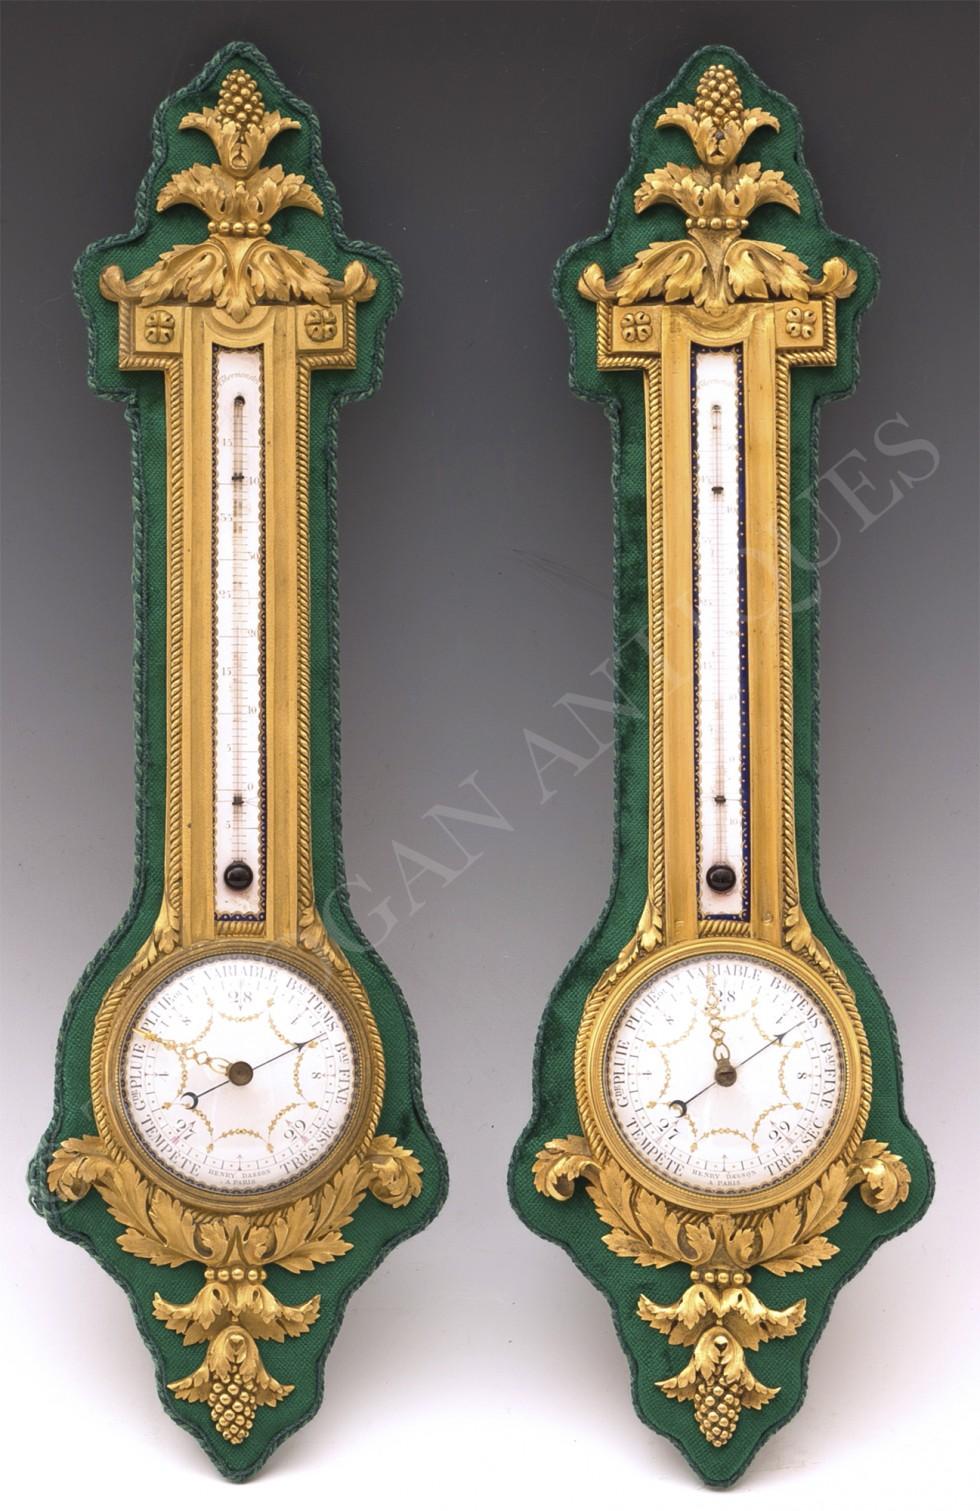 H. Dasson <br/> Barometer Thermometer